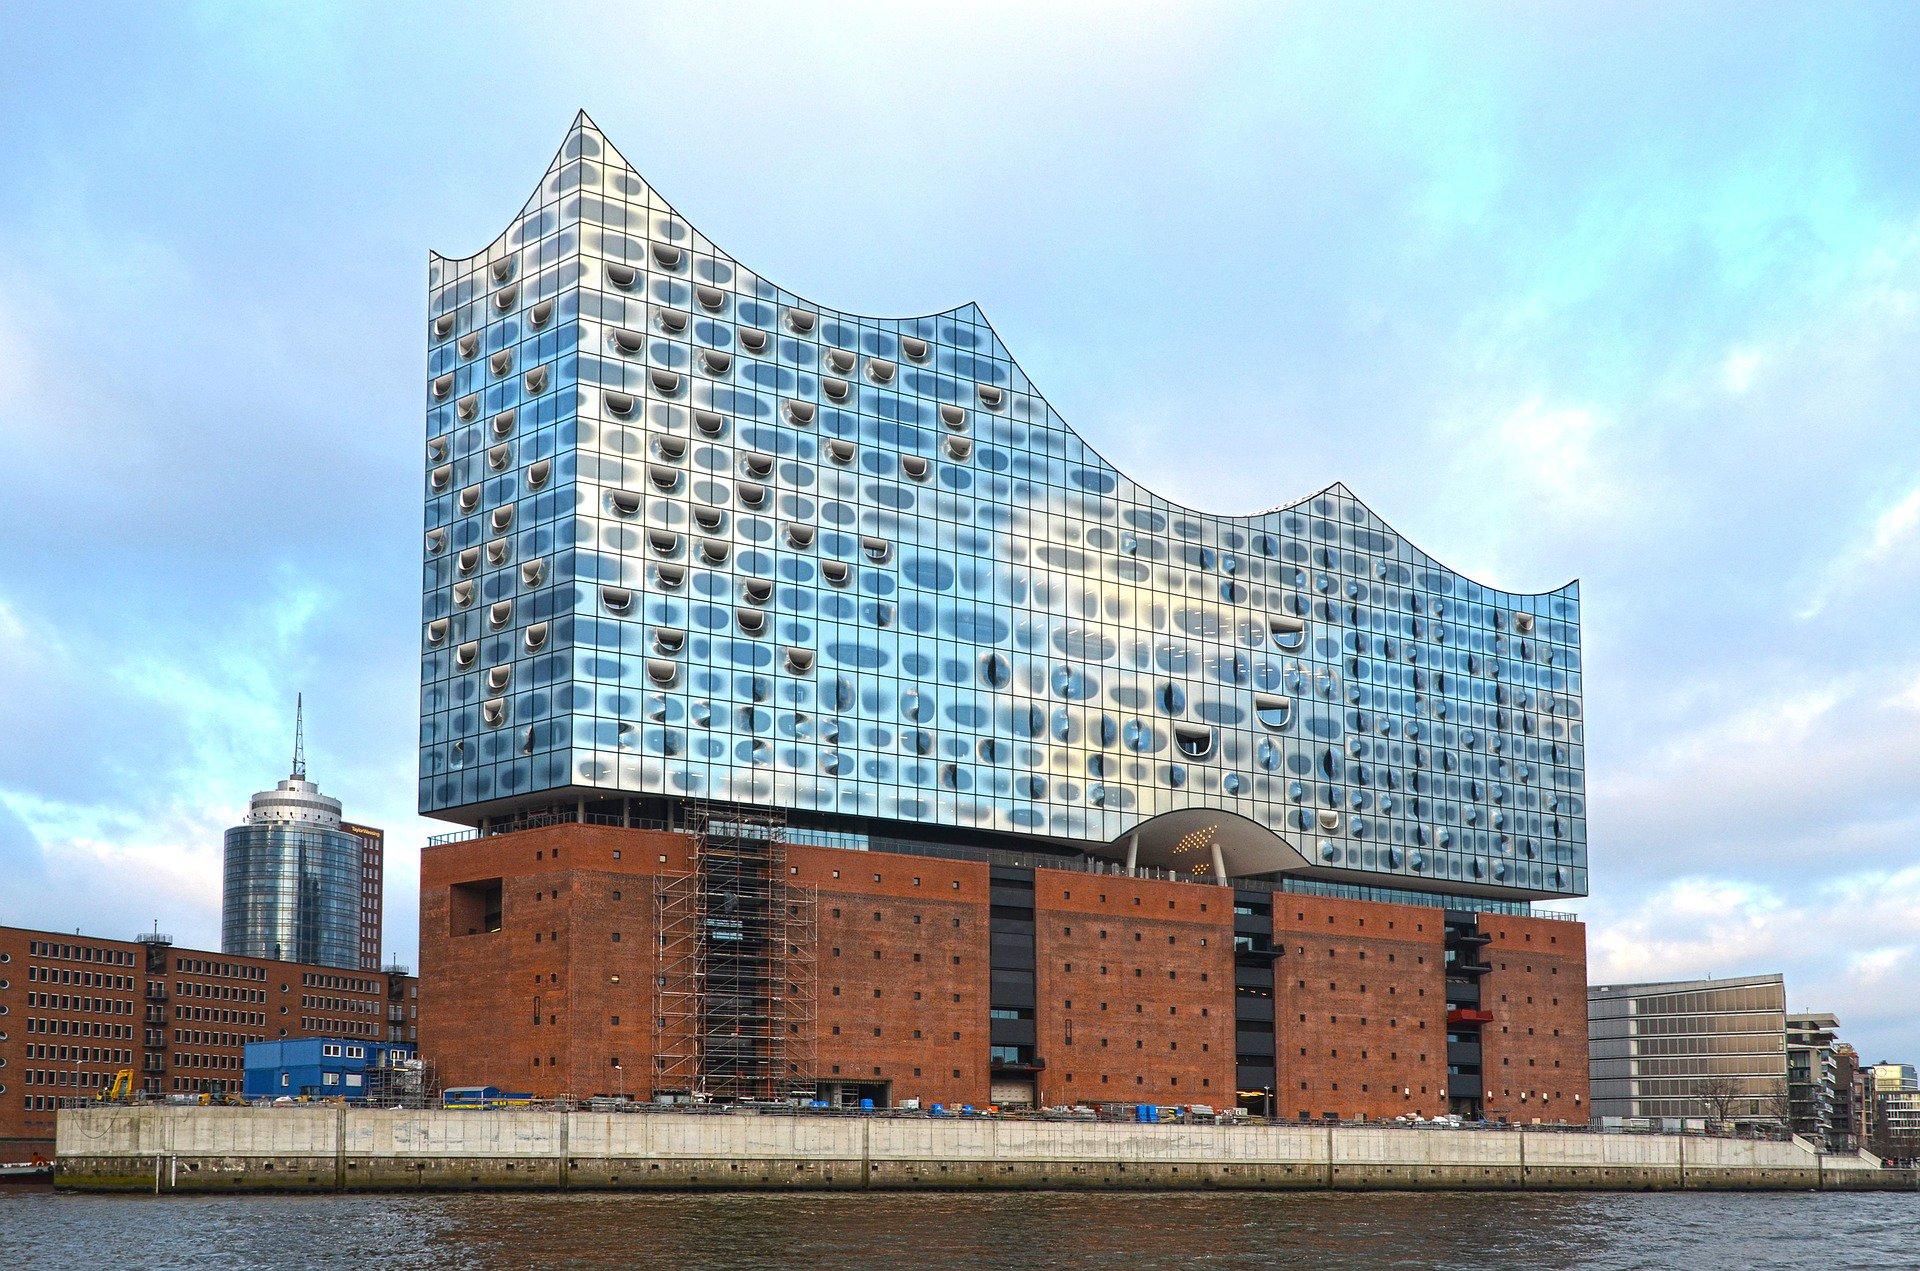 Elbphilharmonie Hamburg architecture